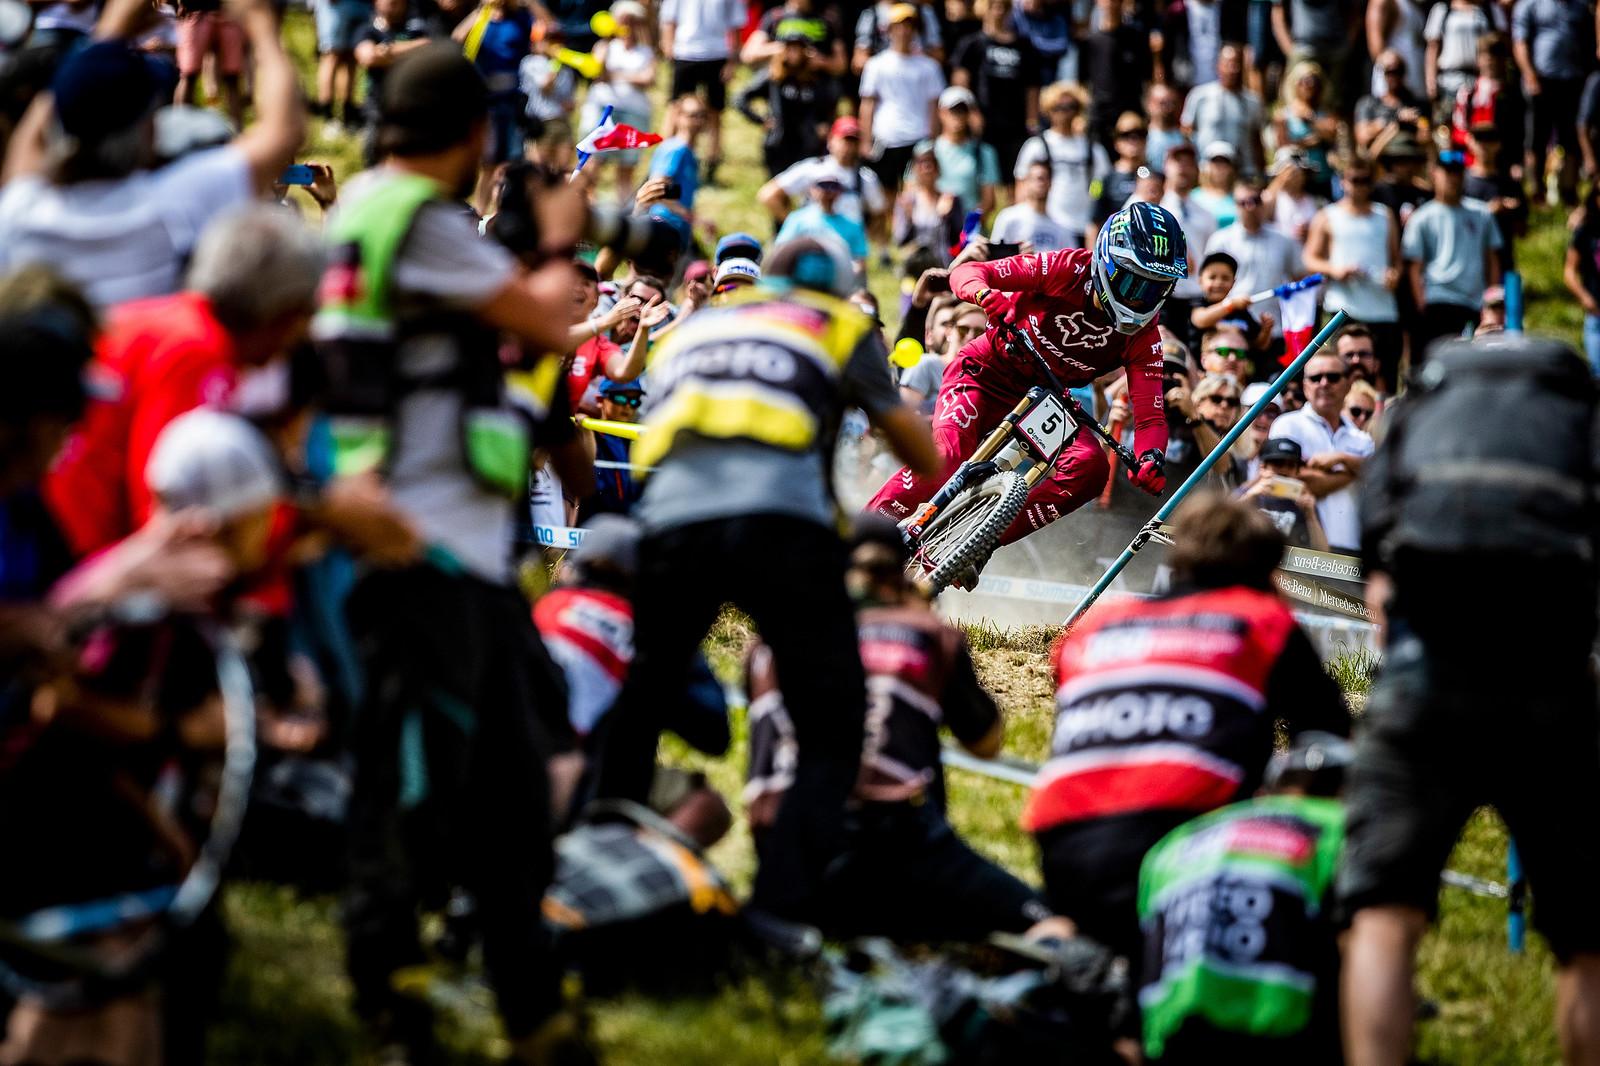 Loris Threading Needles in Les Gets - Loris Vergier 2019 World Cup Downhill Photos - Mountain Biking Pictures - Vital MTB